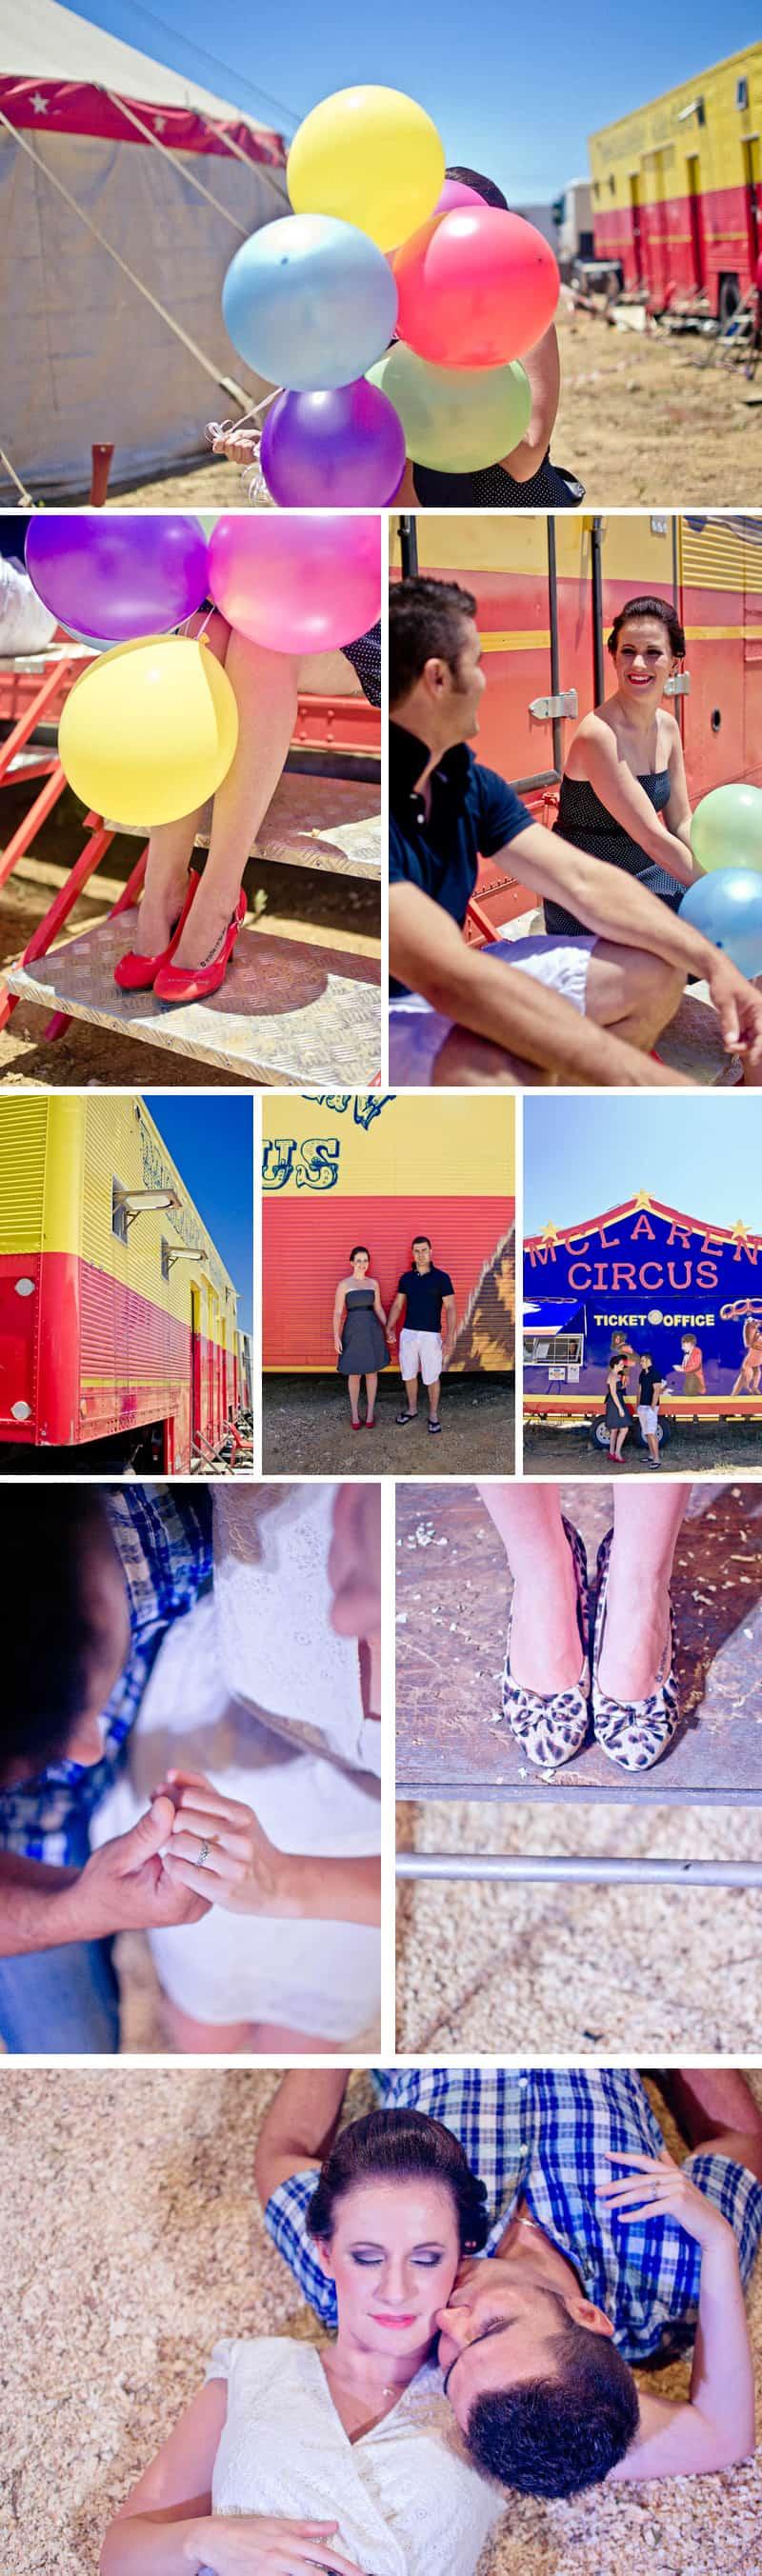 Erna Loock Circus Engagement